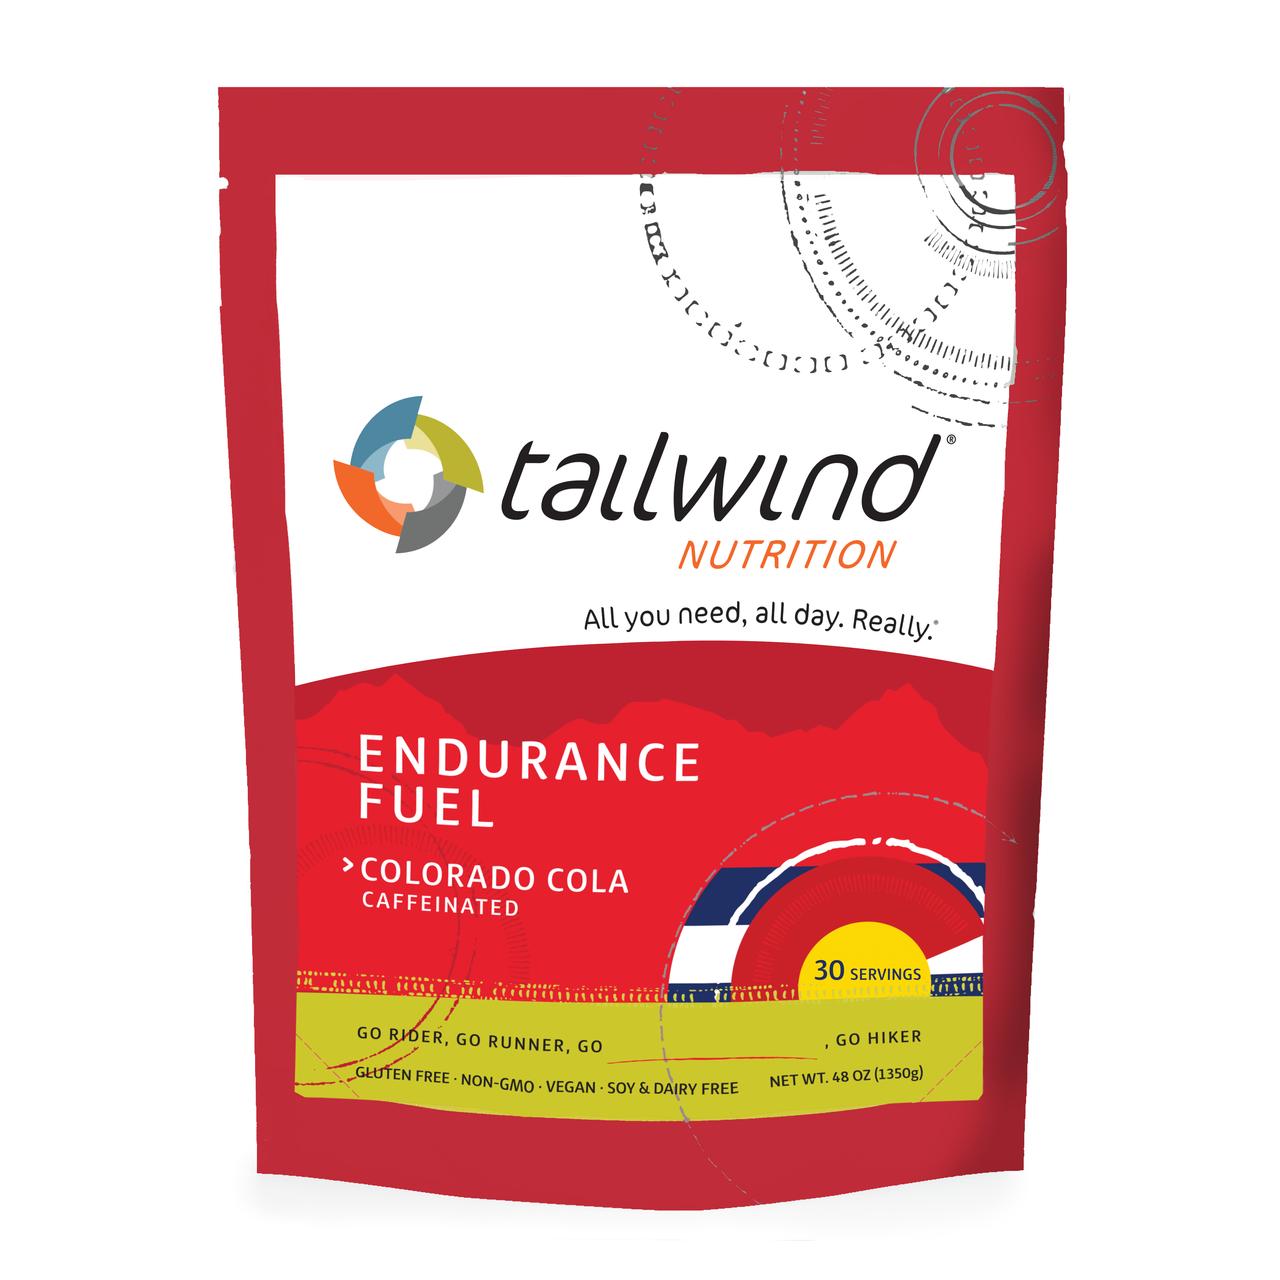 TAILWIND CAFFEINATED ENDURANCE FUEL COLORADO COLA